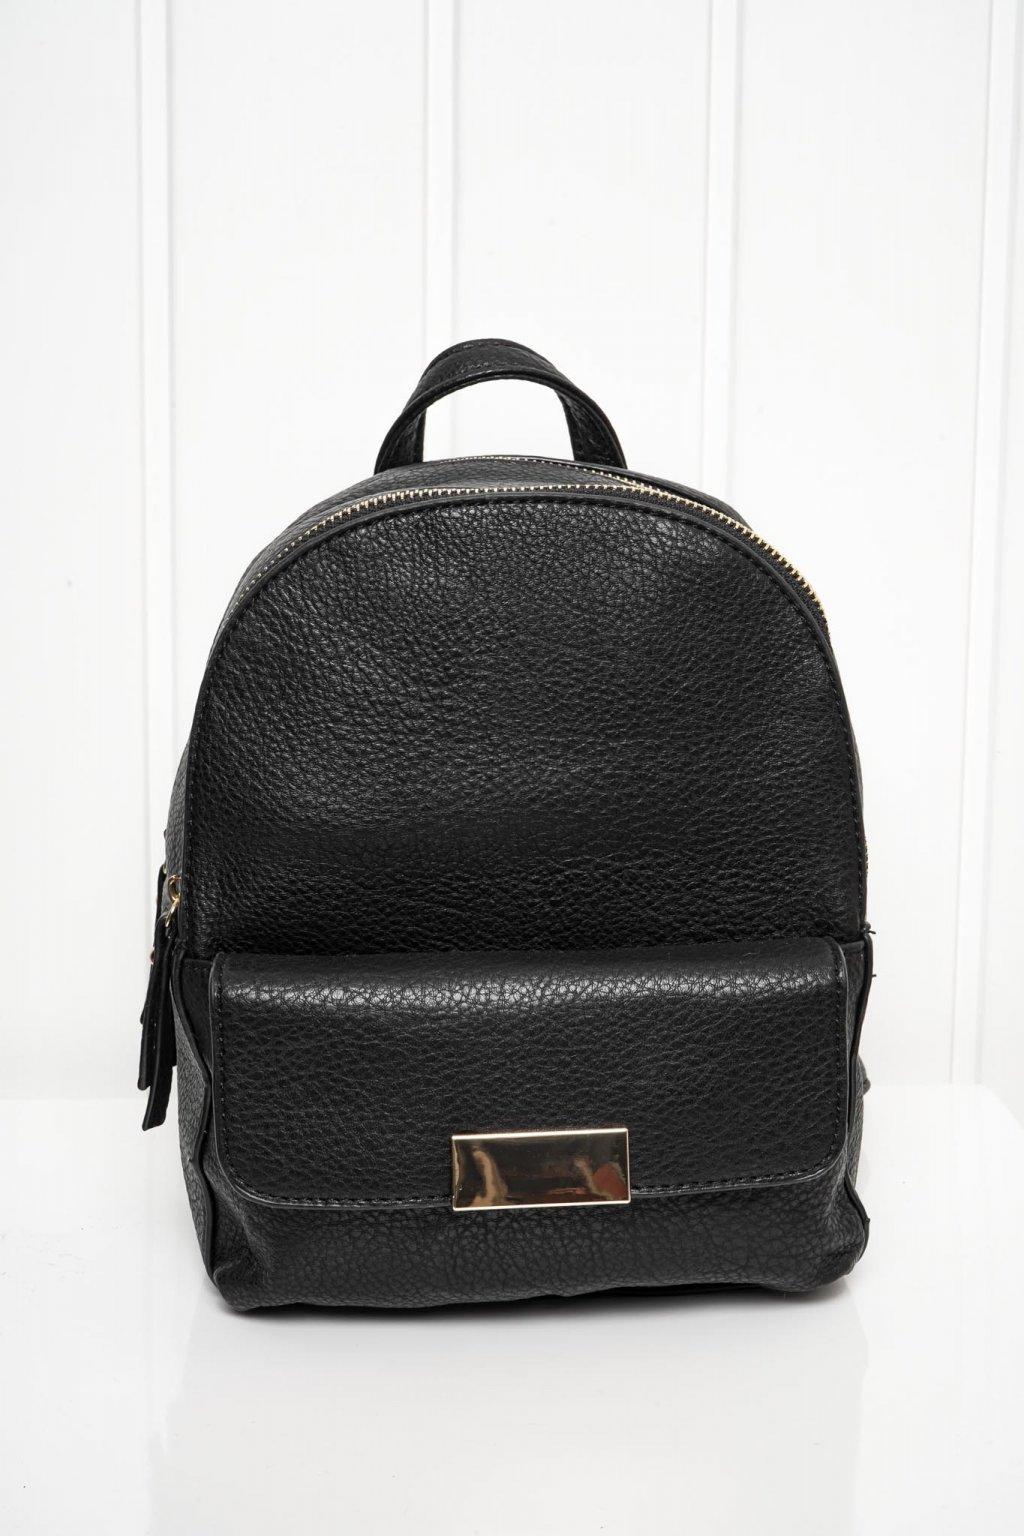 Kabelka, crossbody, ruksak, shopping bag, shopperka, 440